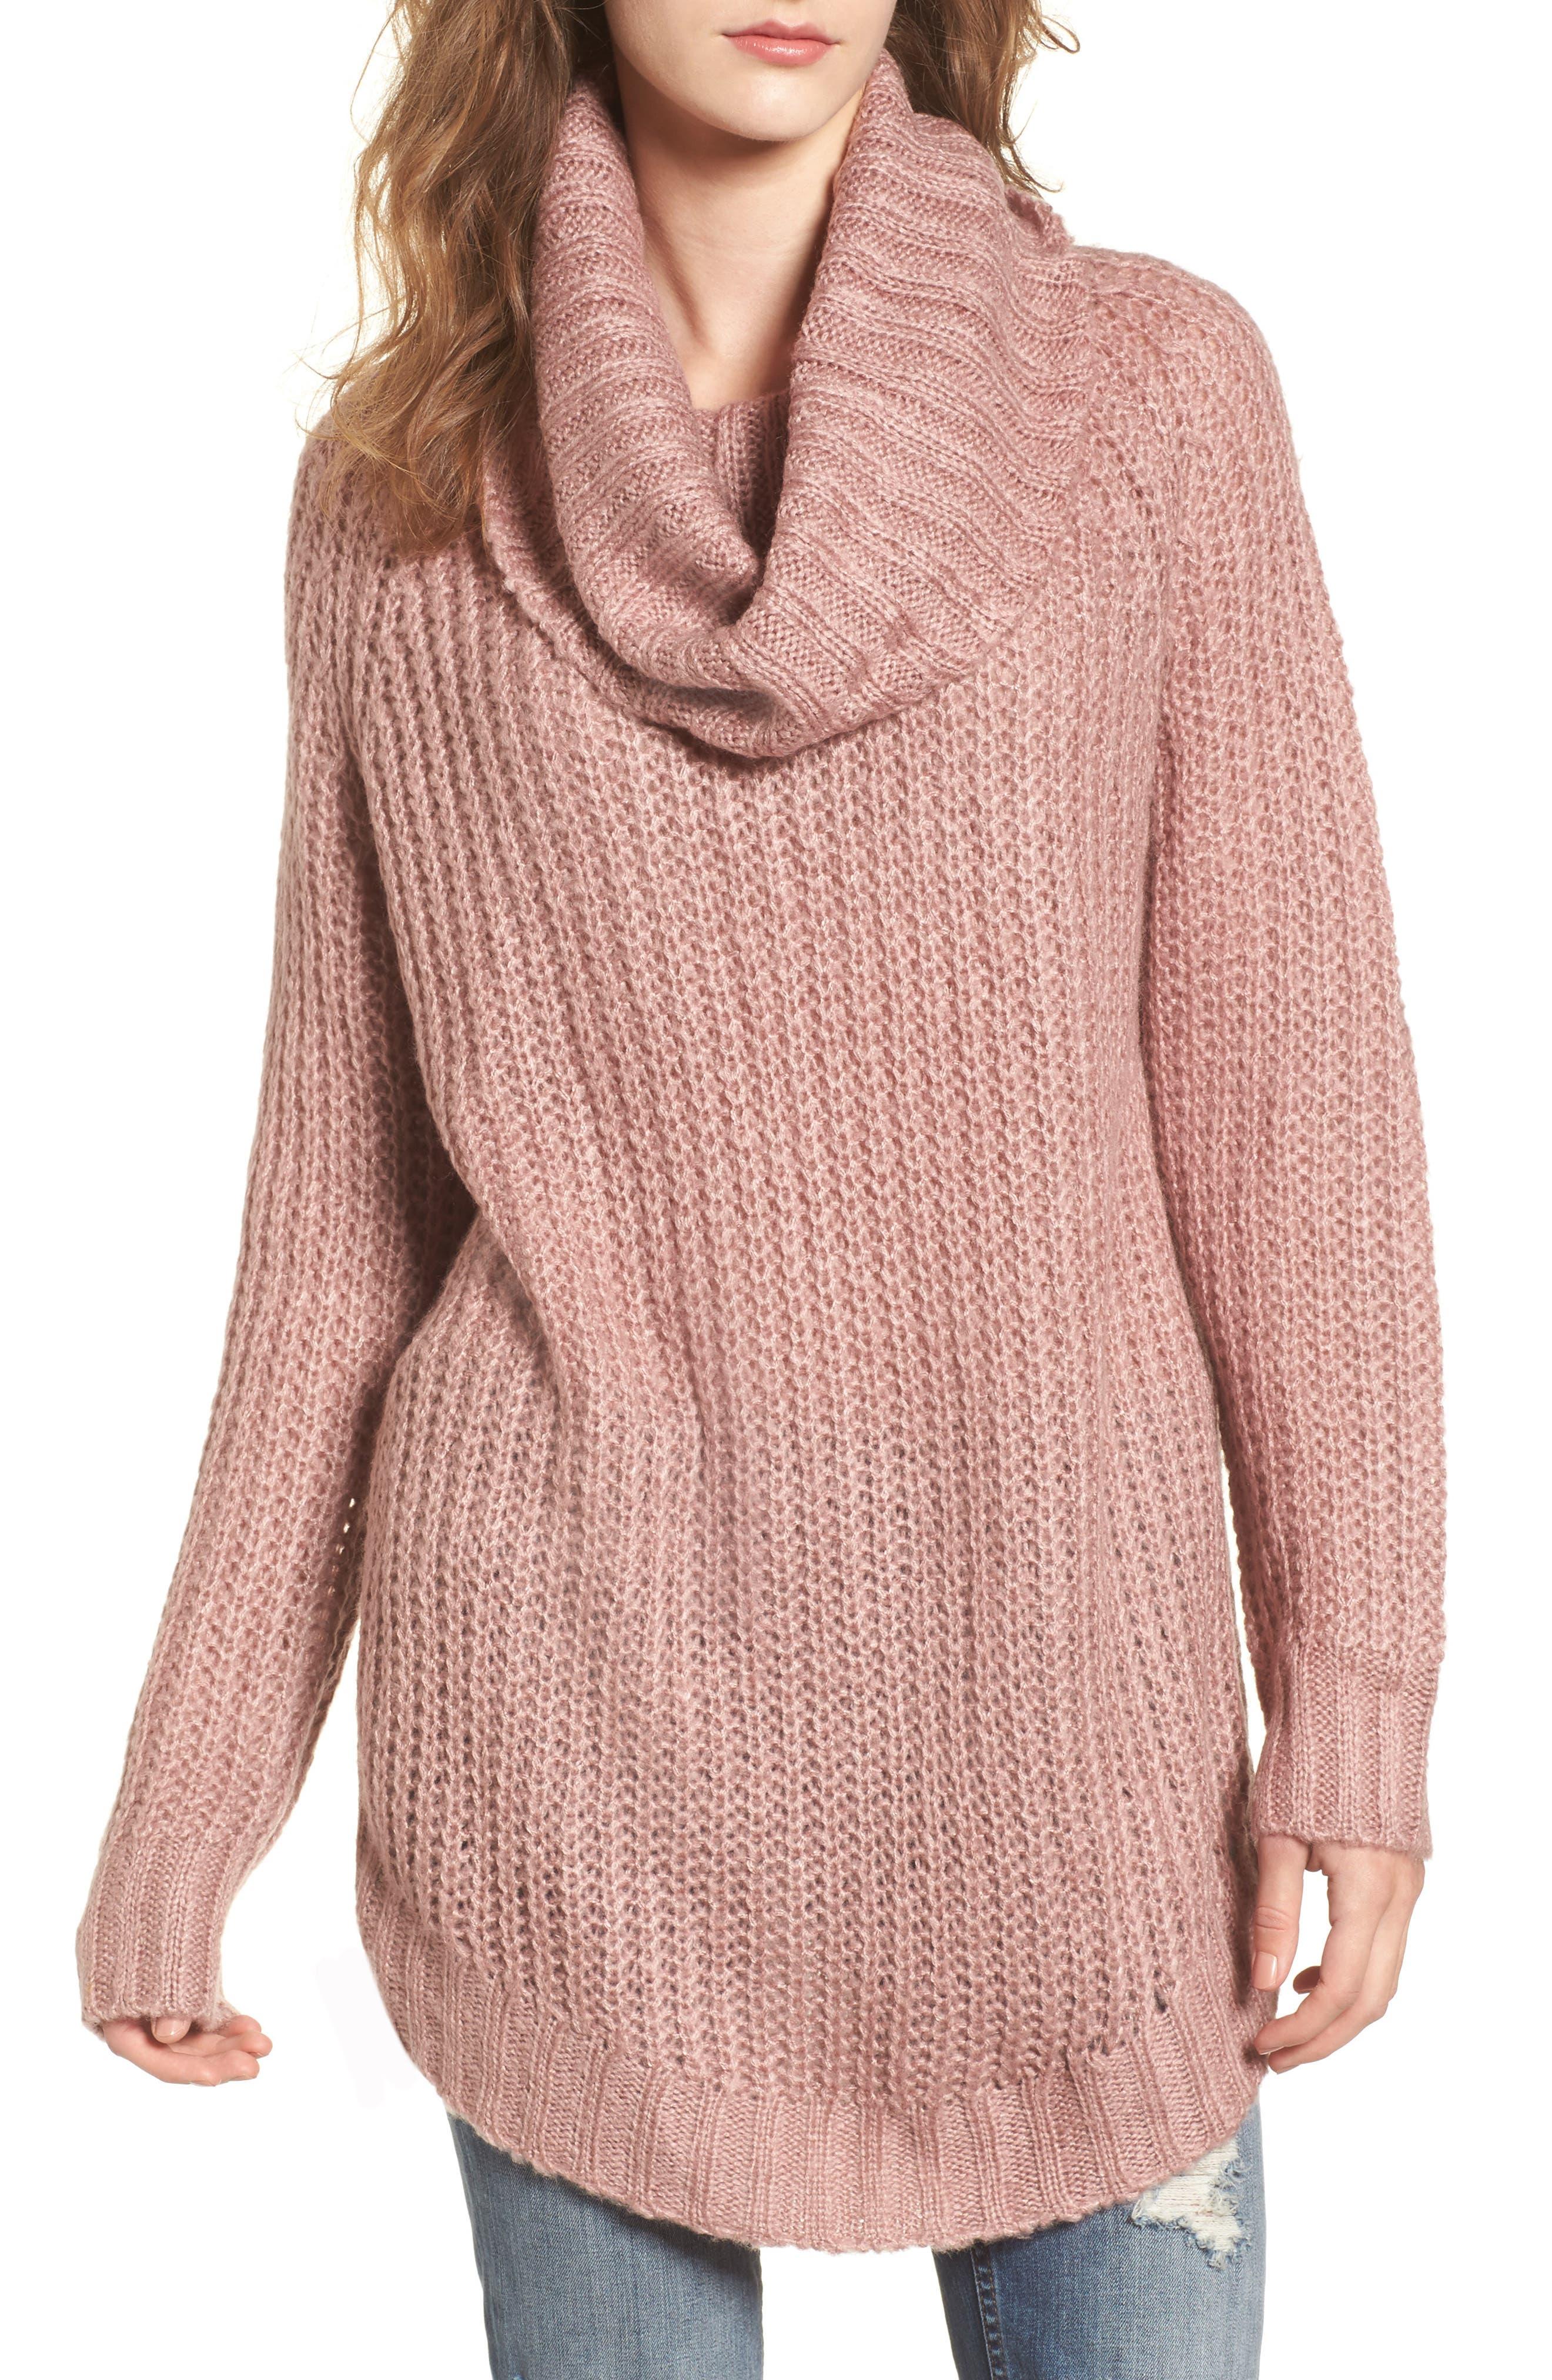 Cowl Neck Sweater,                             Main thumbnail 1, color,                             680